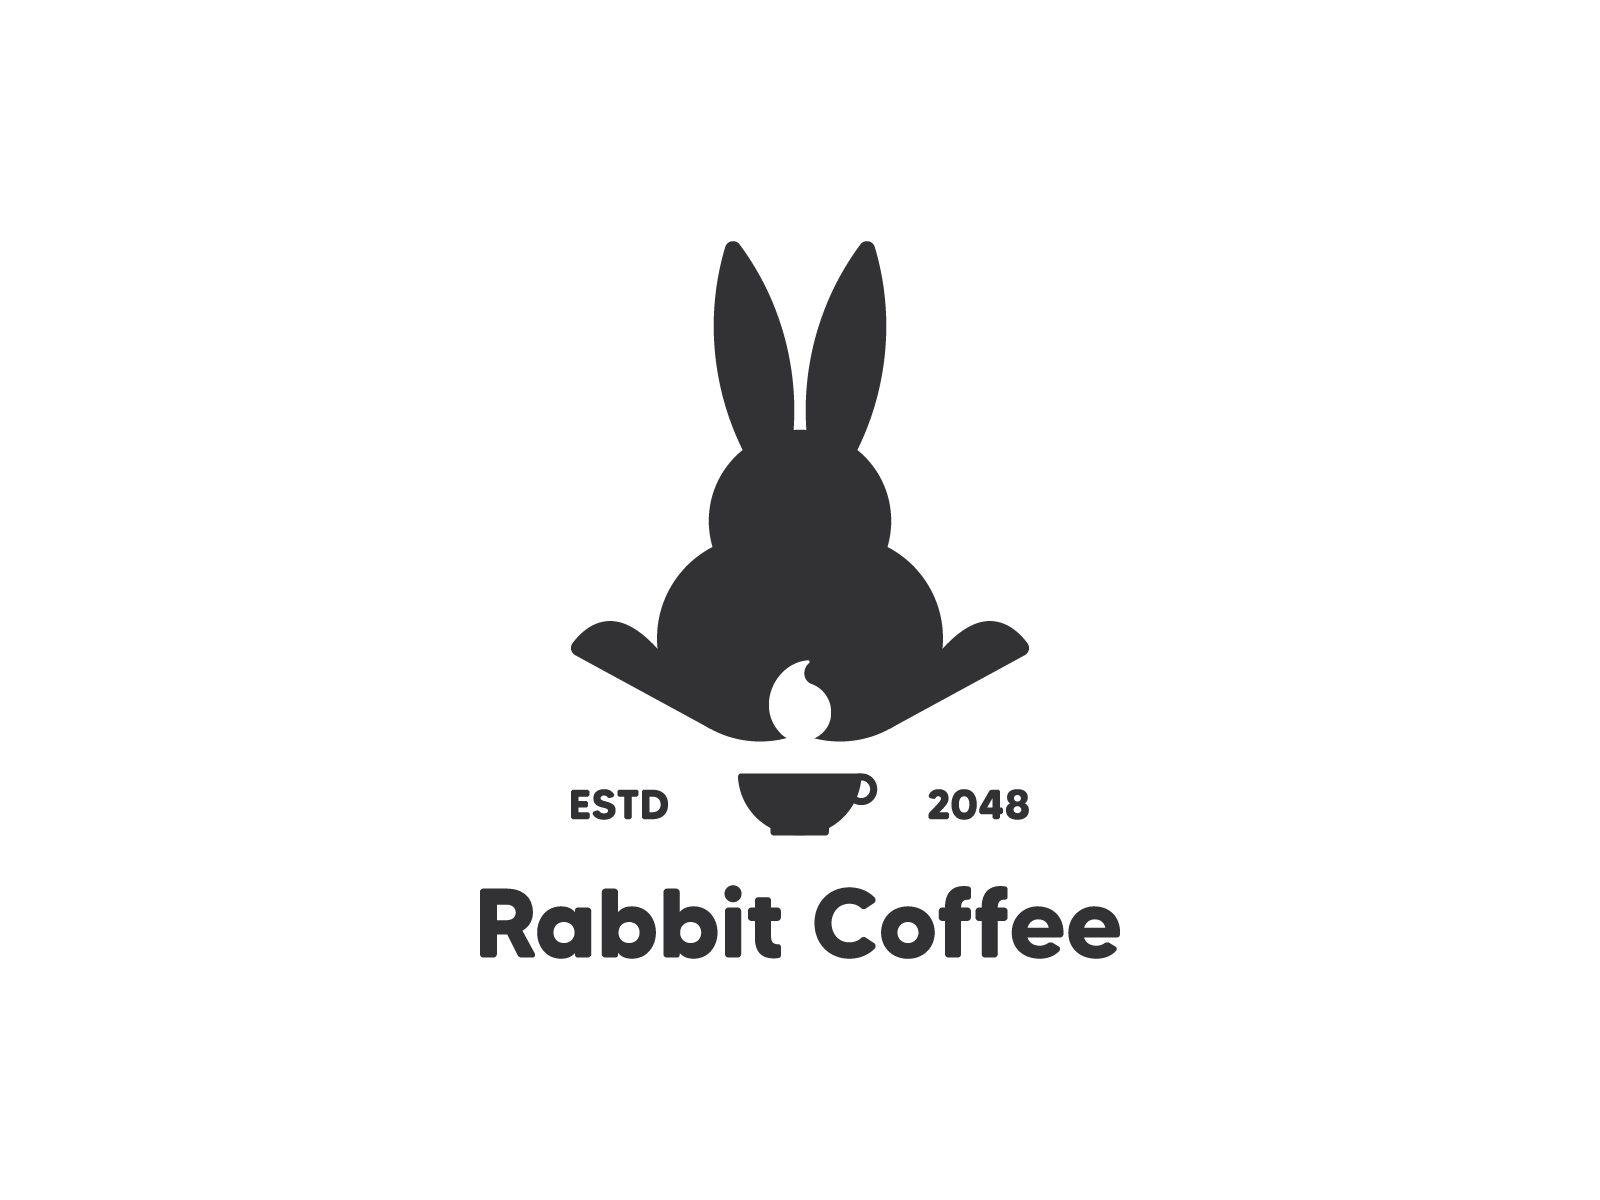 Rabbit Coffee